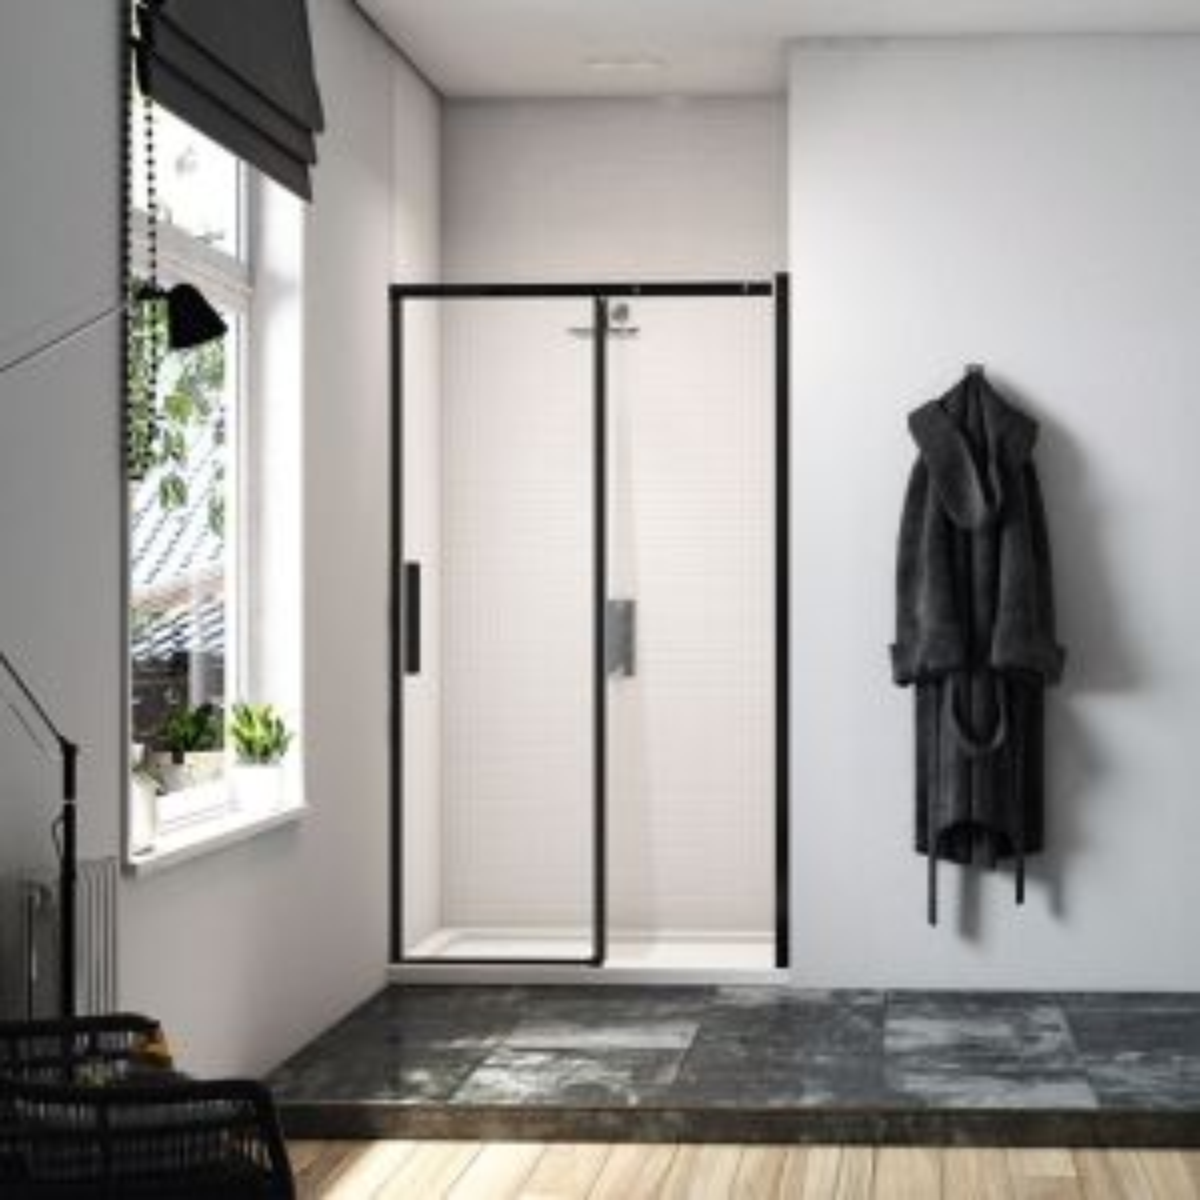 Merlyn Black Sliding Shower Door in an alcove